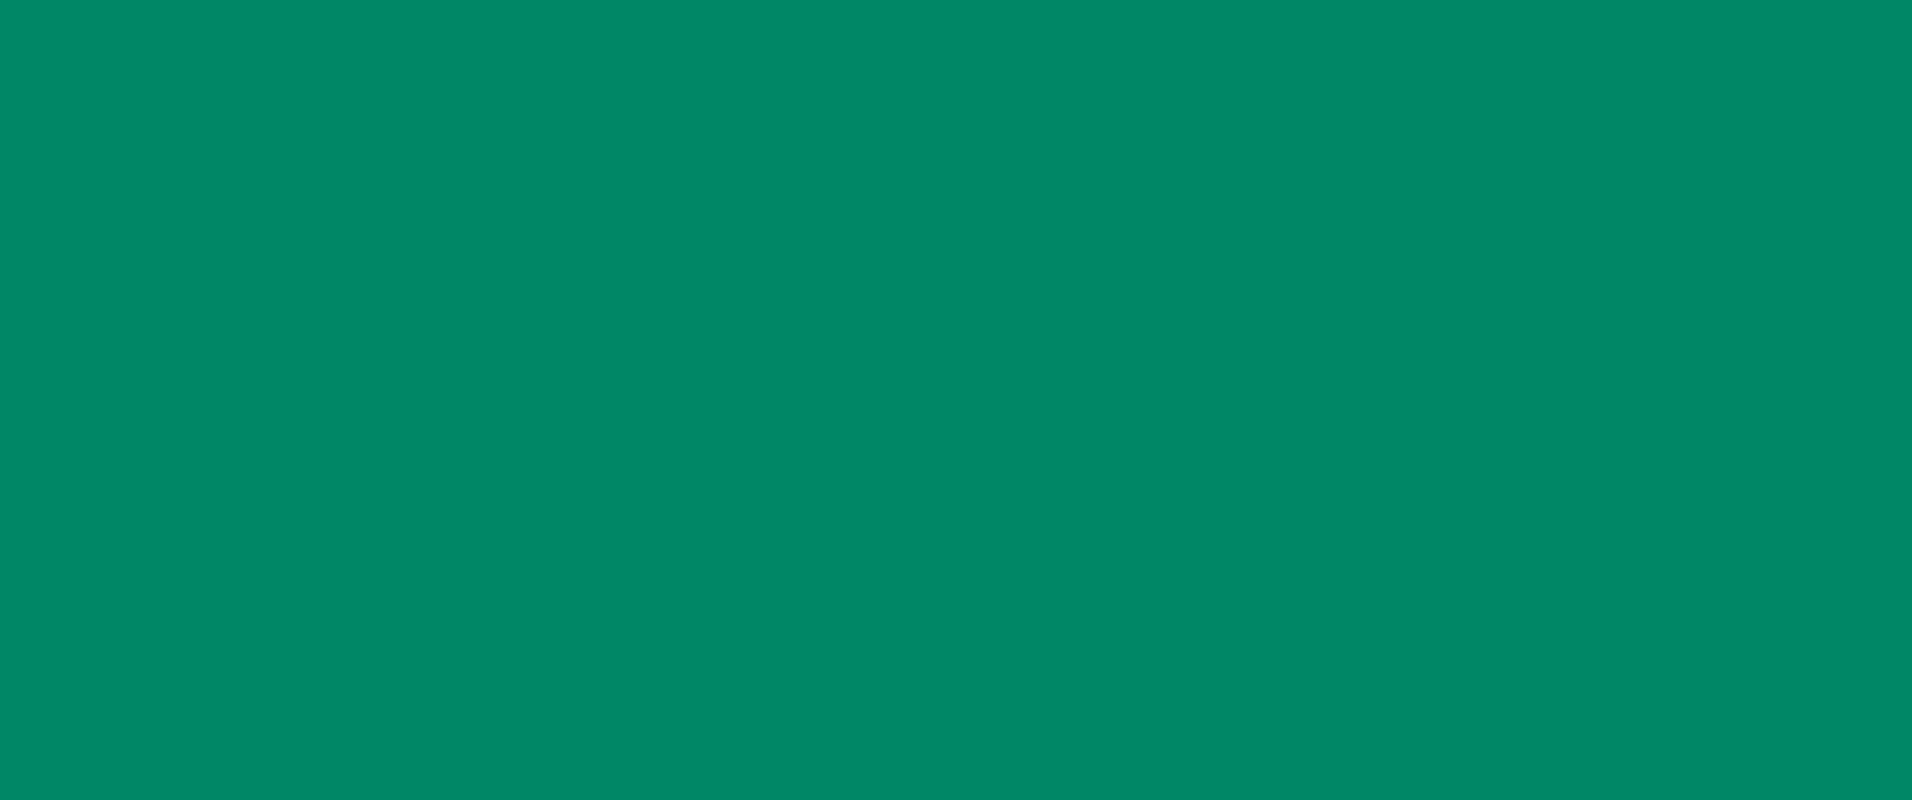 Textielmarker - medium, 2 - 4 mm,groen